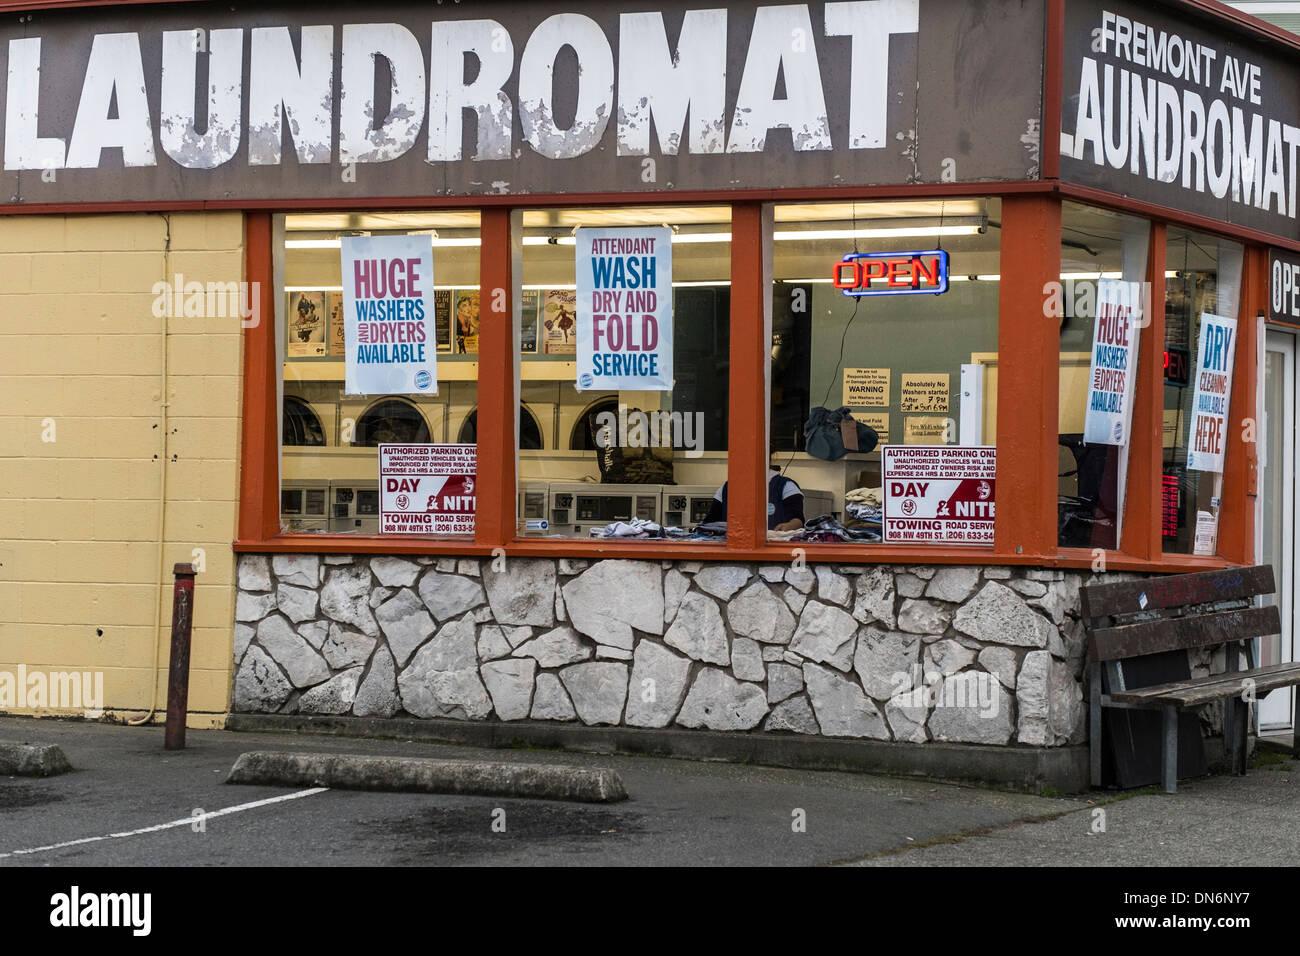 Laundromat america stock photos laundromat america stock images seattle fremont laundromat stock image solutioingenieria Images